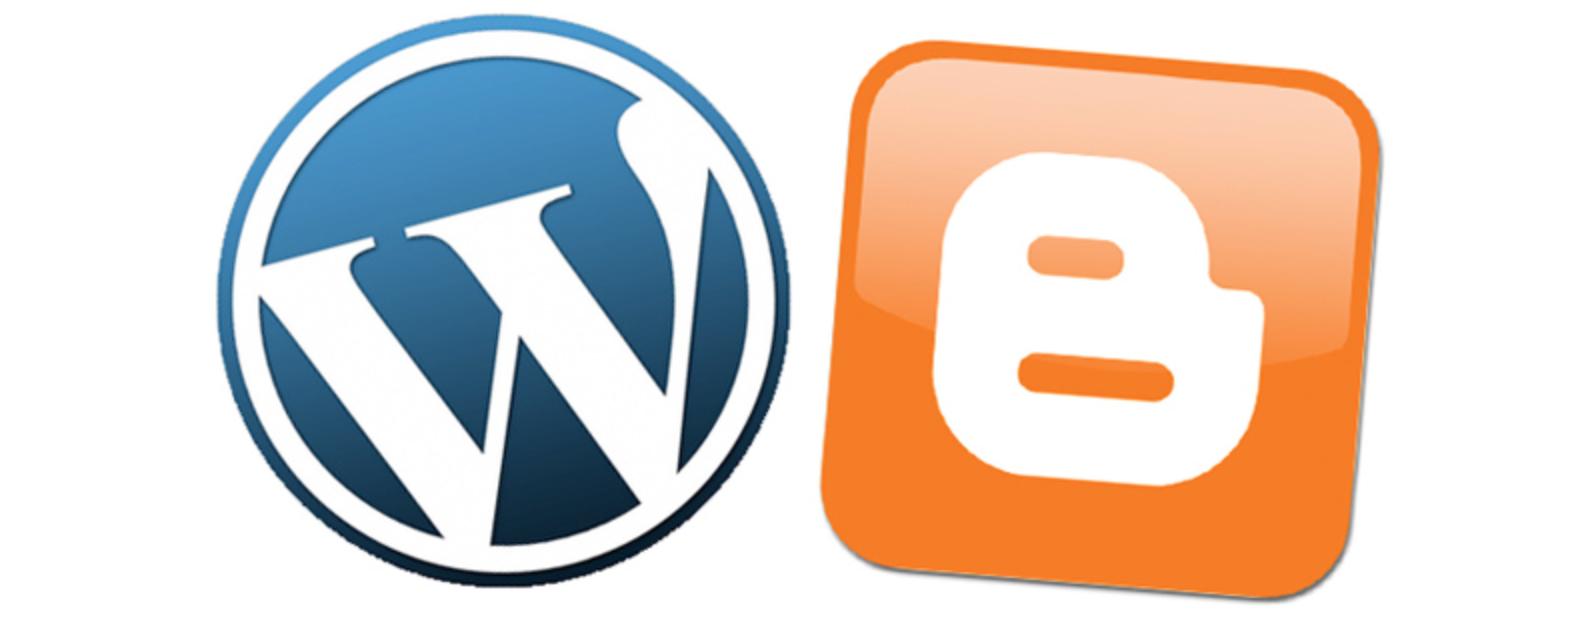 Blogger or WordPress?